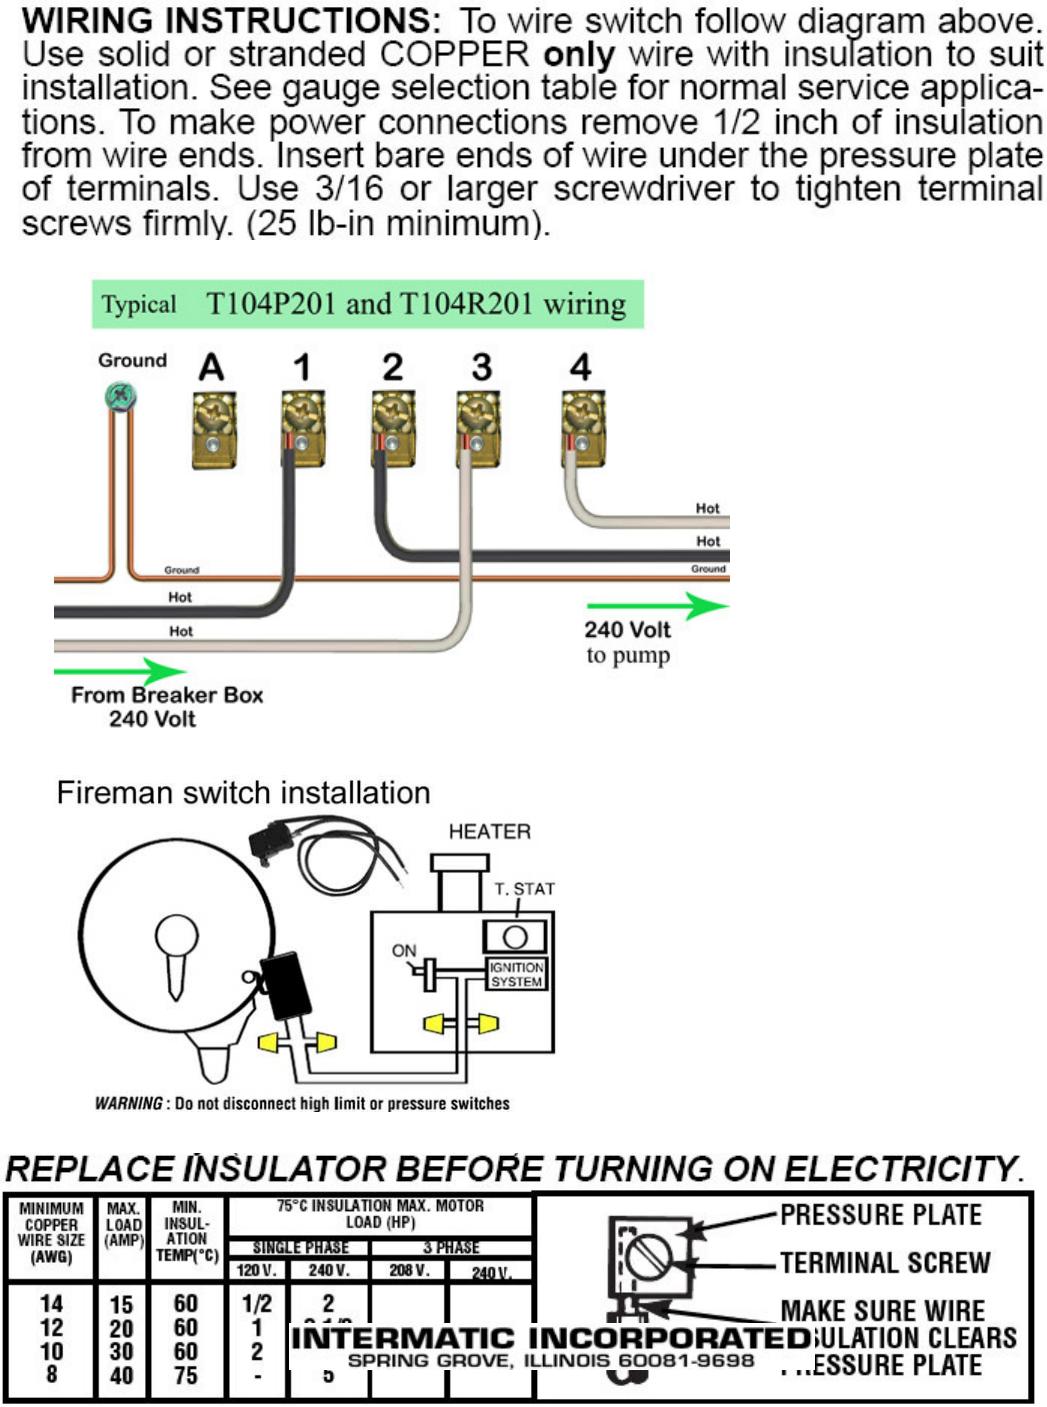 [SCHEMATICS_43NM]  Intermatic T104P201 instruction manual T104R201 | Intermatic T104r201 Wiring Diagram |  | UserManual.wiki